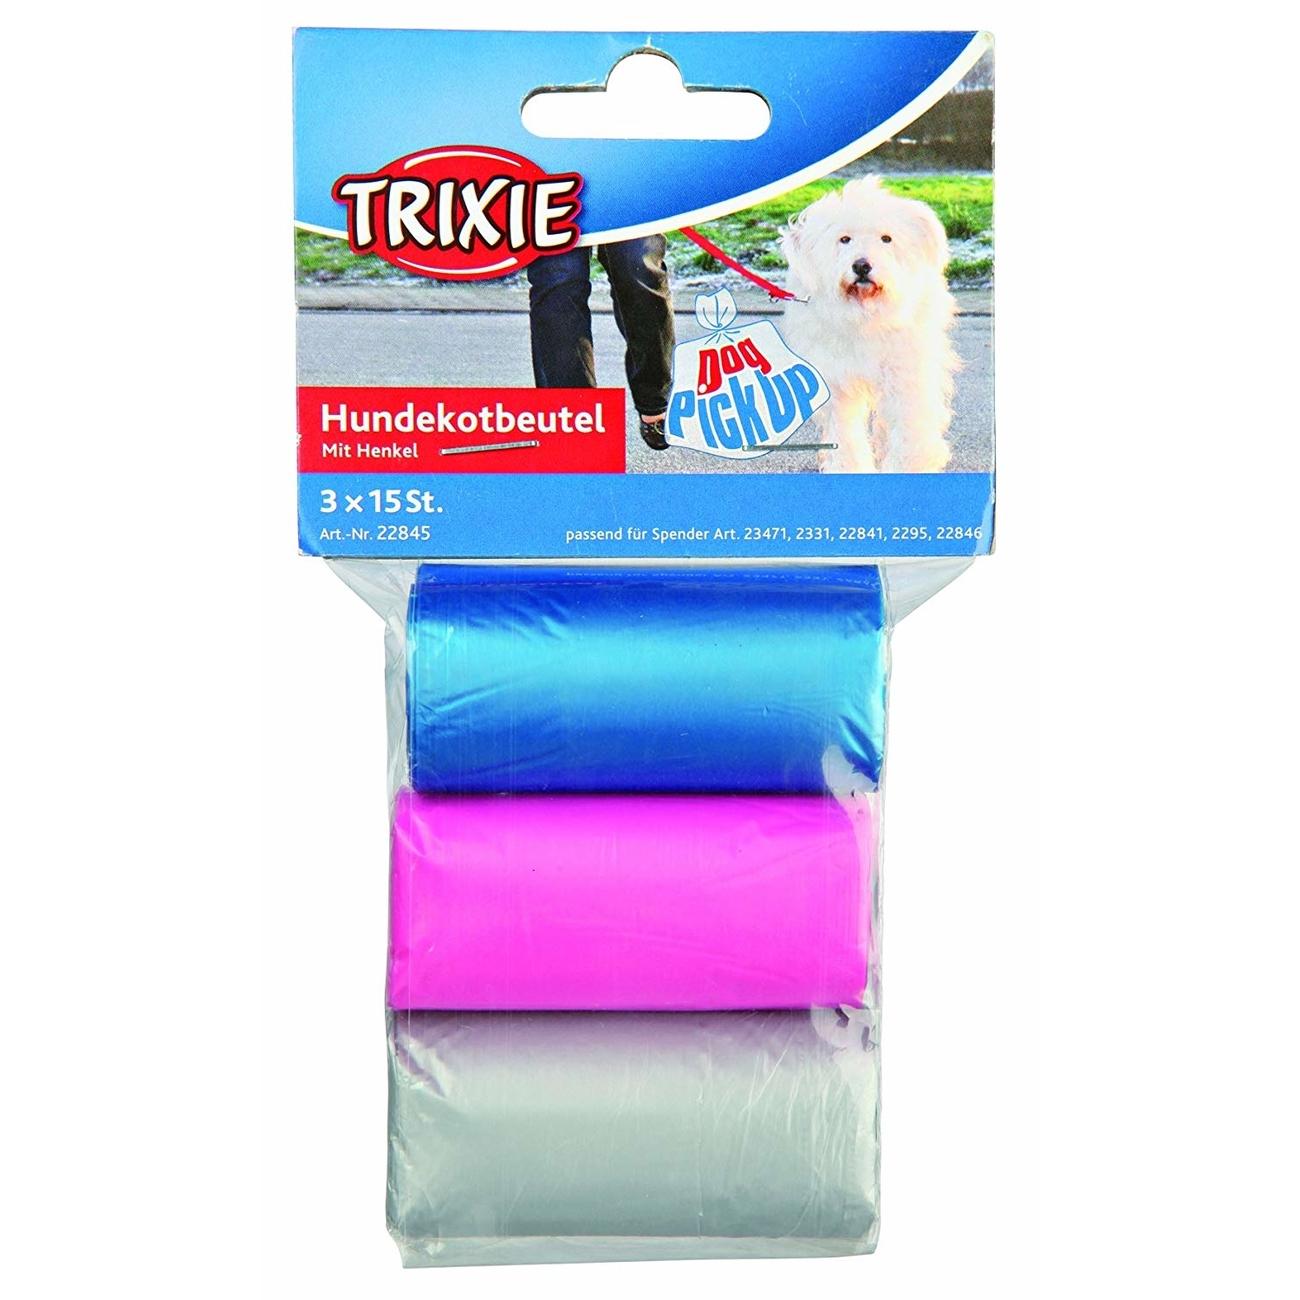 Trixie Hundekotbeutel mit Henkel 22845